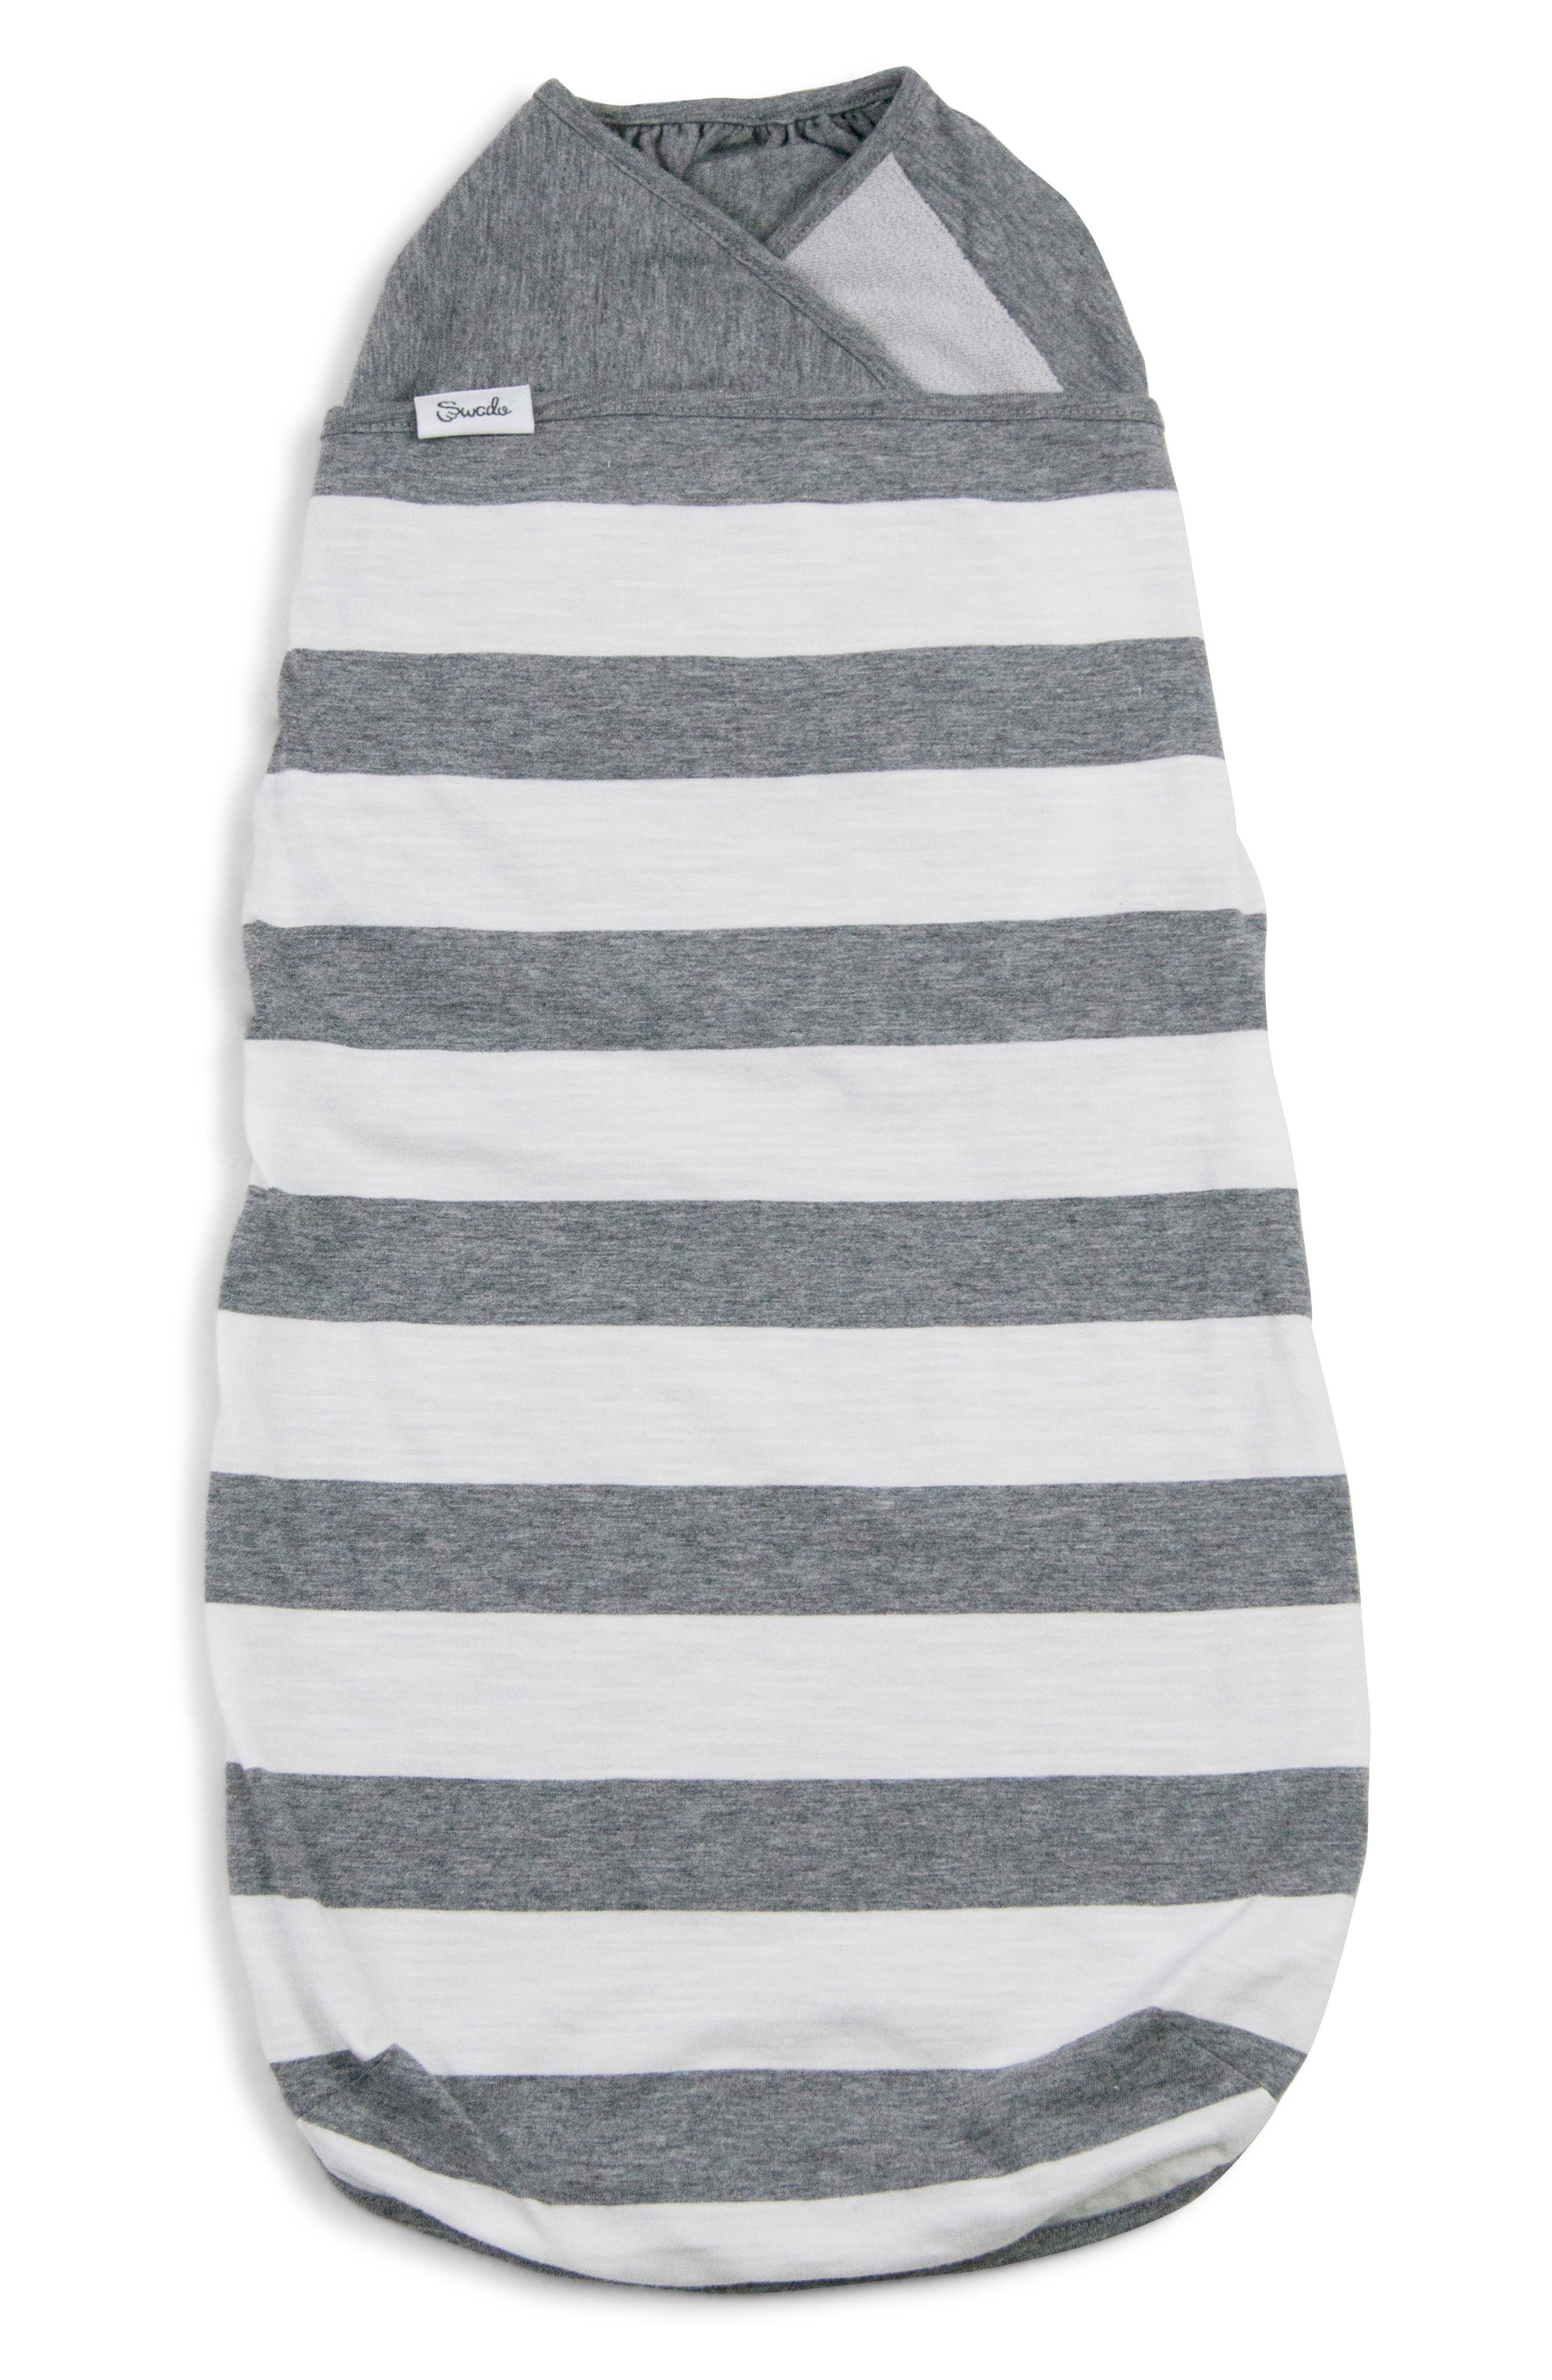 Stripe Wearable Swaddle,                             Main thumbnail 1, color,                             GREY/ WHITE STRIPE